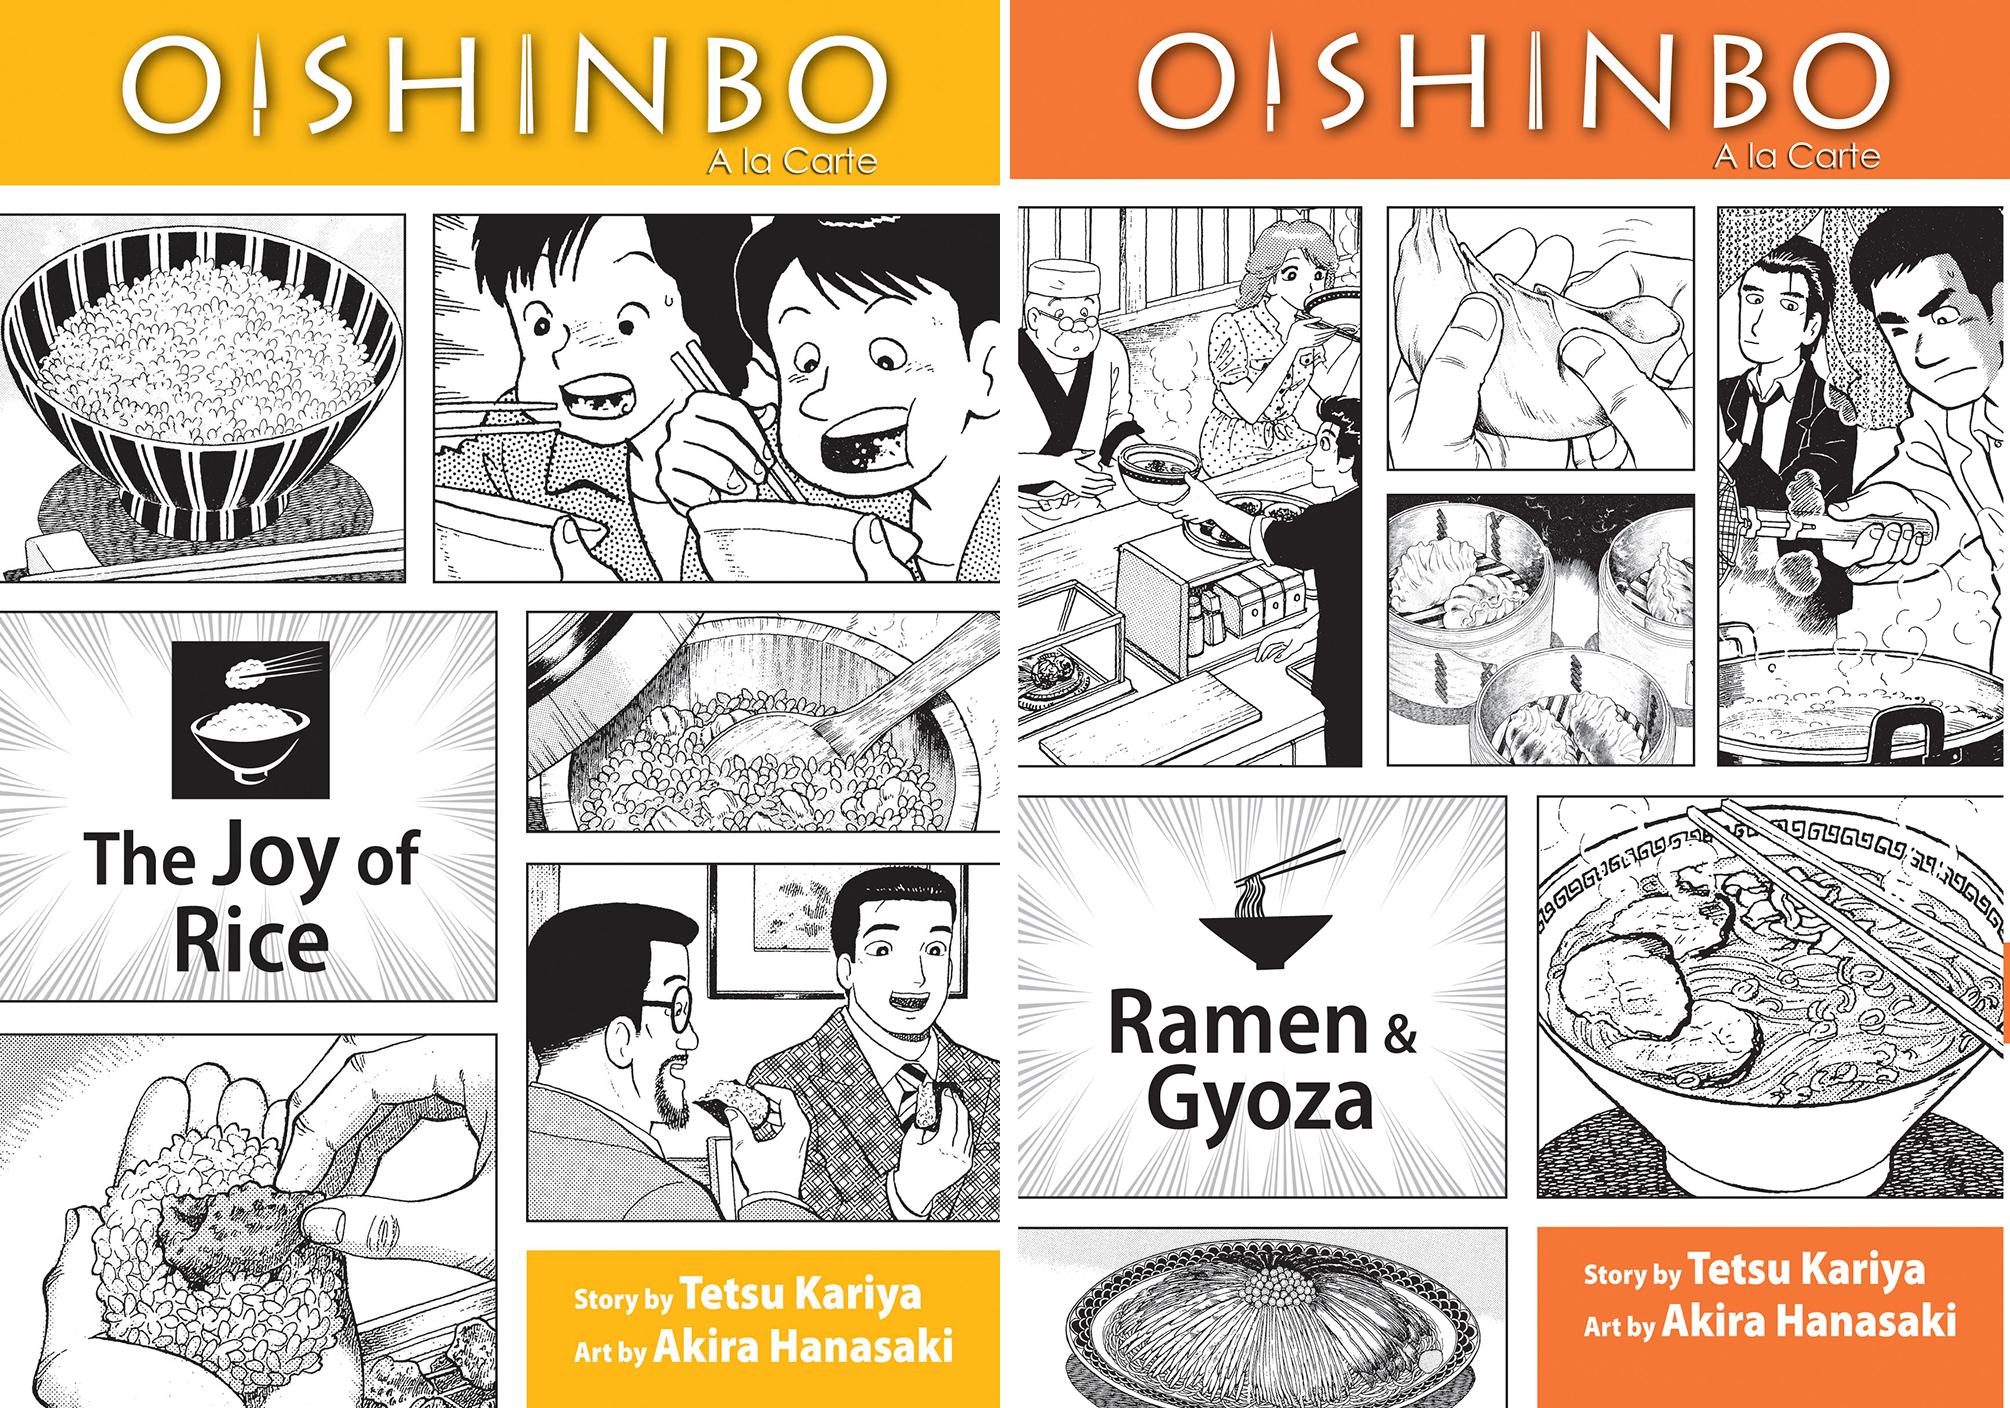 Oishinbo, written by Tetsu Kariya and drawn by Akira Hanasaki, is one of the oldest of the food manga.